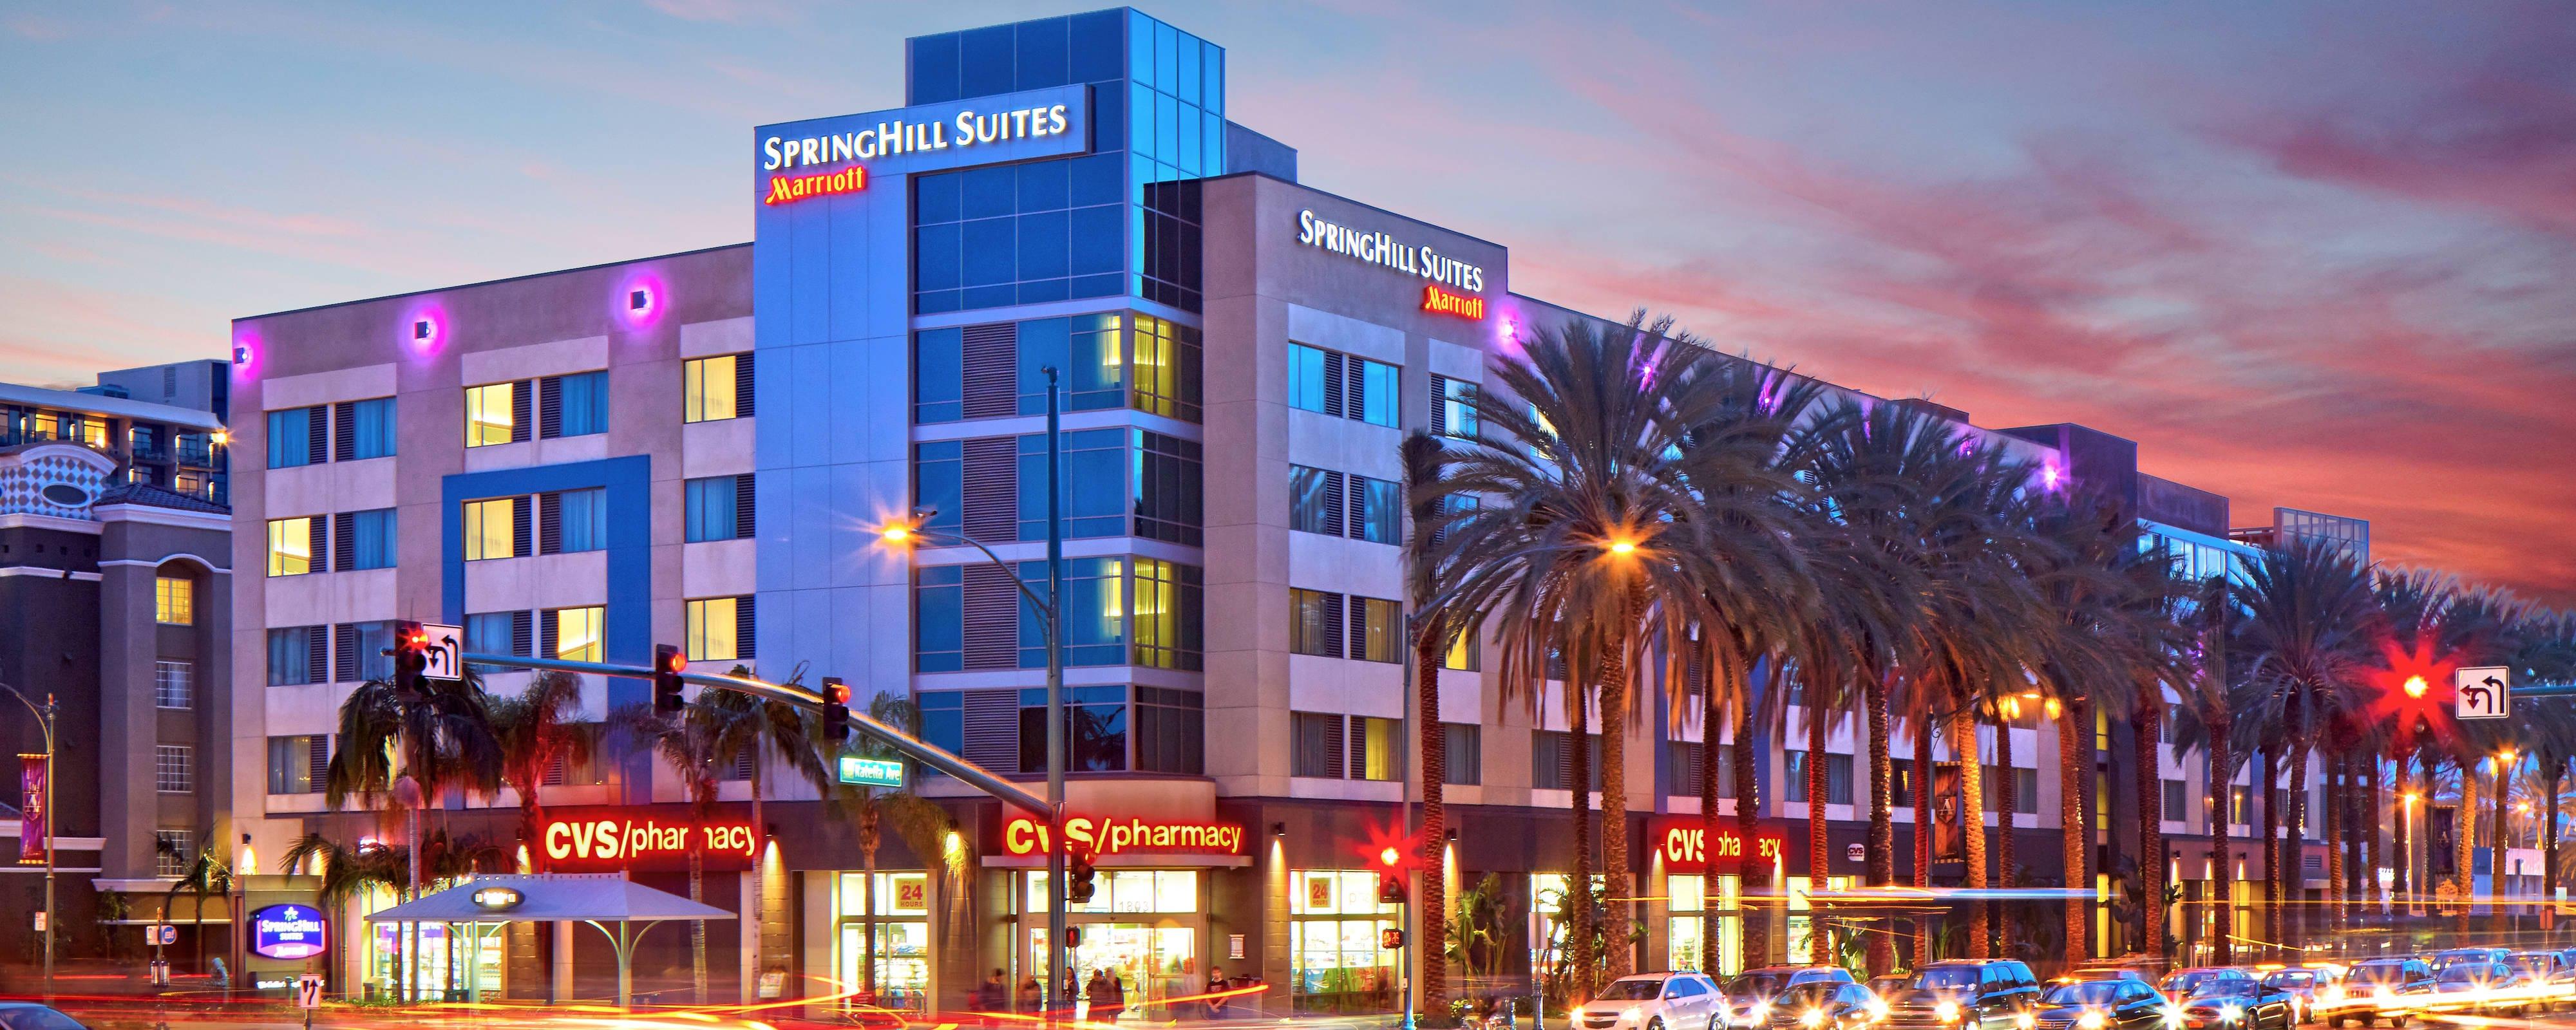 anaheim hotels with kitchen near disneyland clocks for sale springhill resort convention center hotel exterior sunset